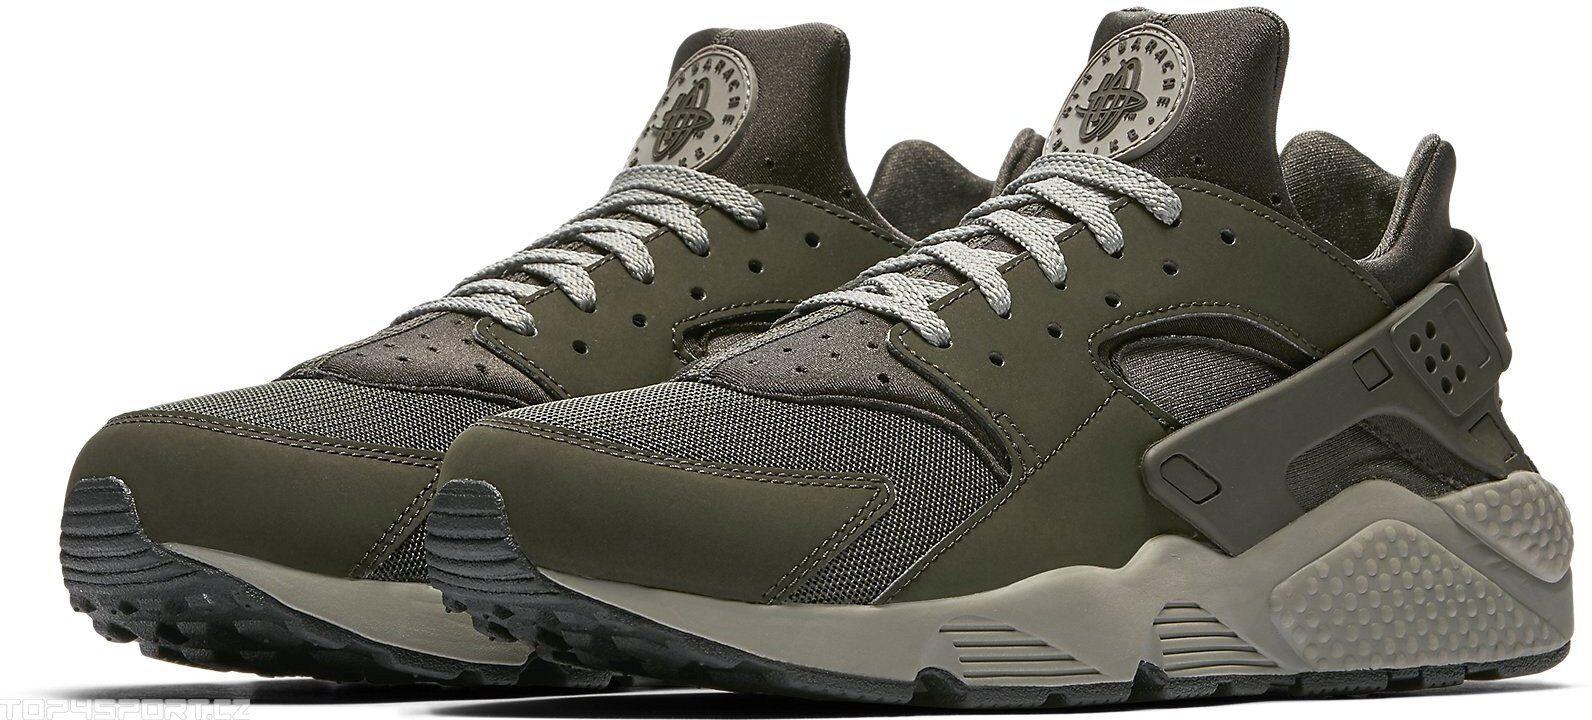 Nike Air Huarache Sequoia Olive Grey 318429-311 Men Size 13 Running Training